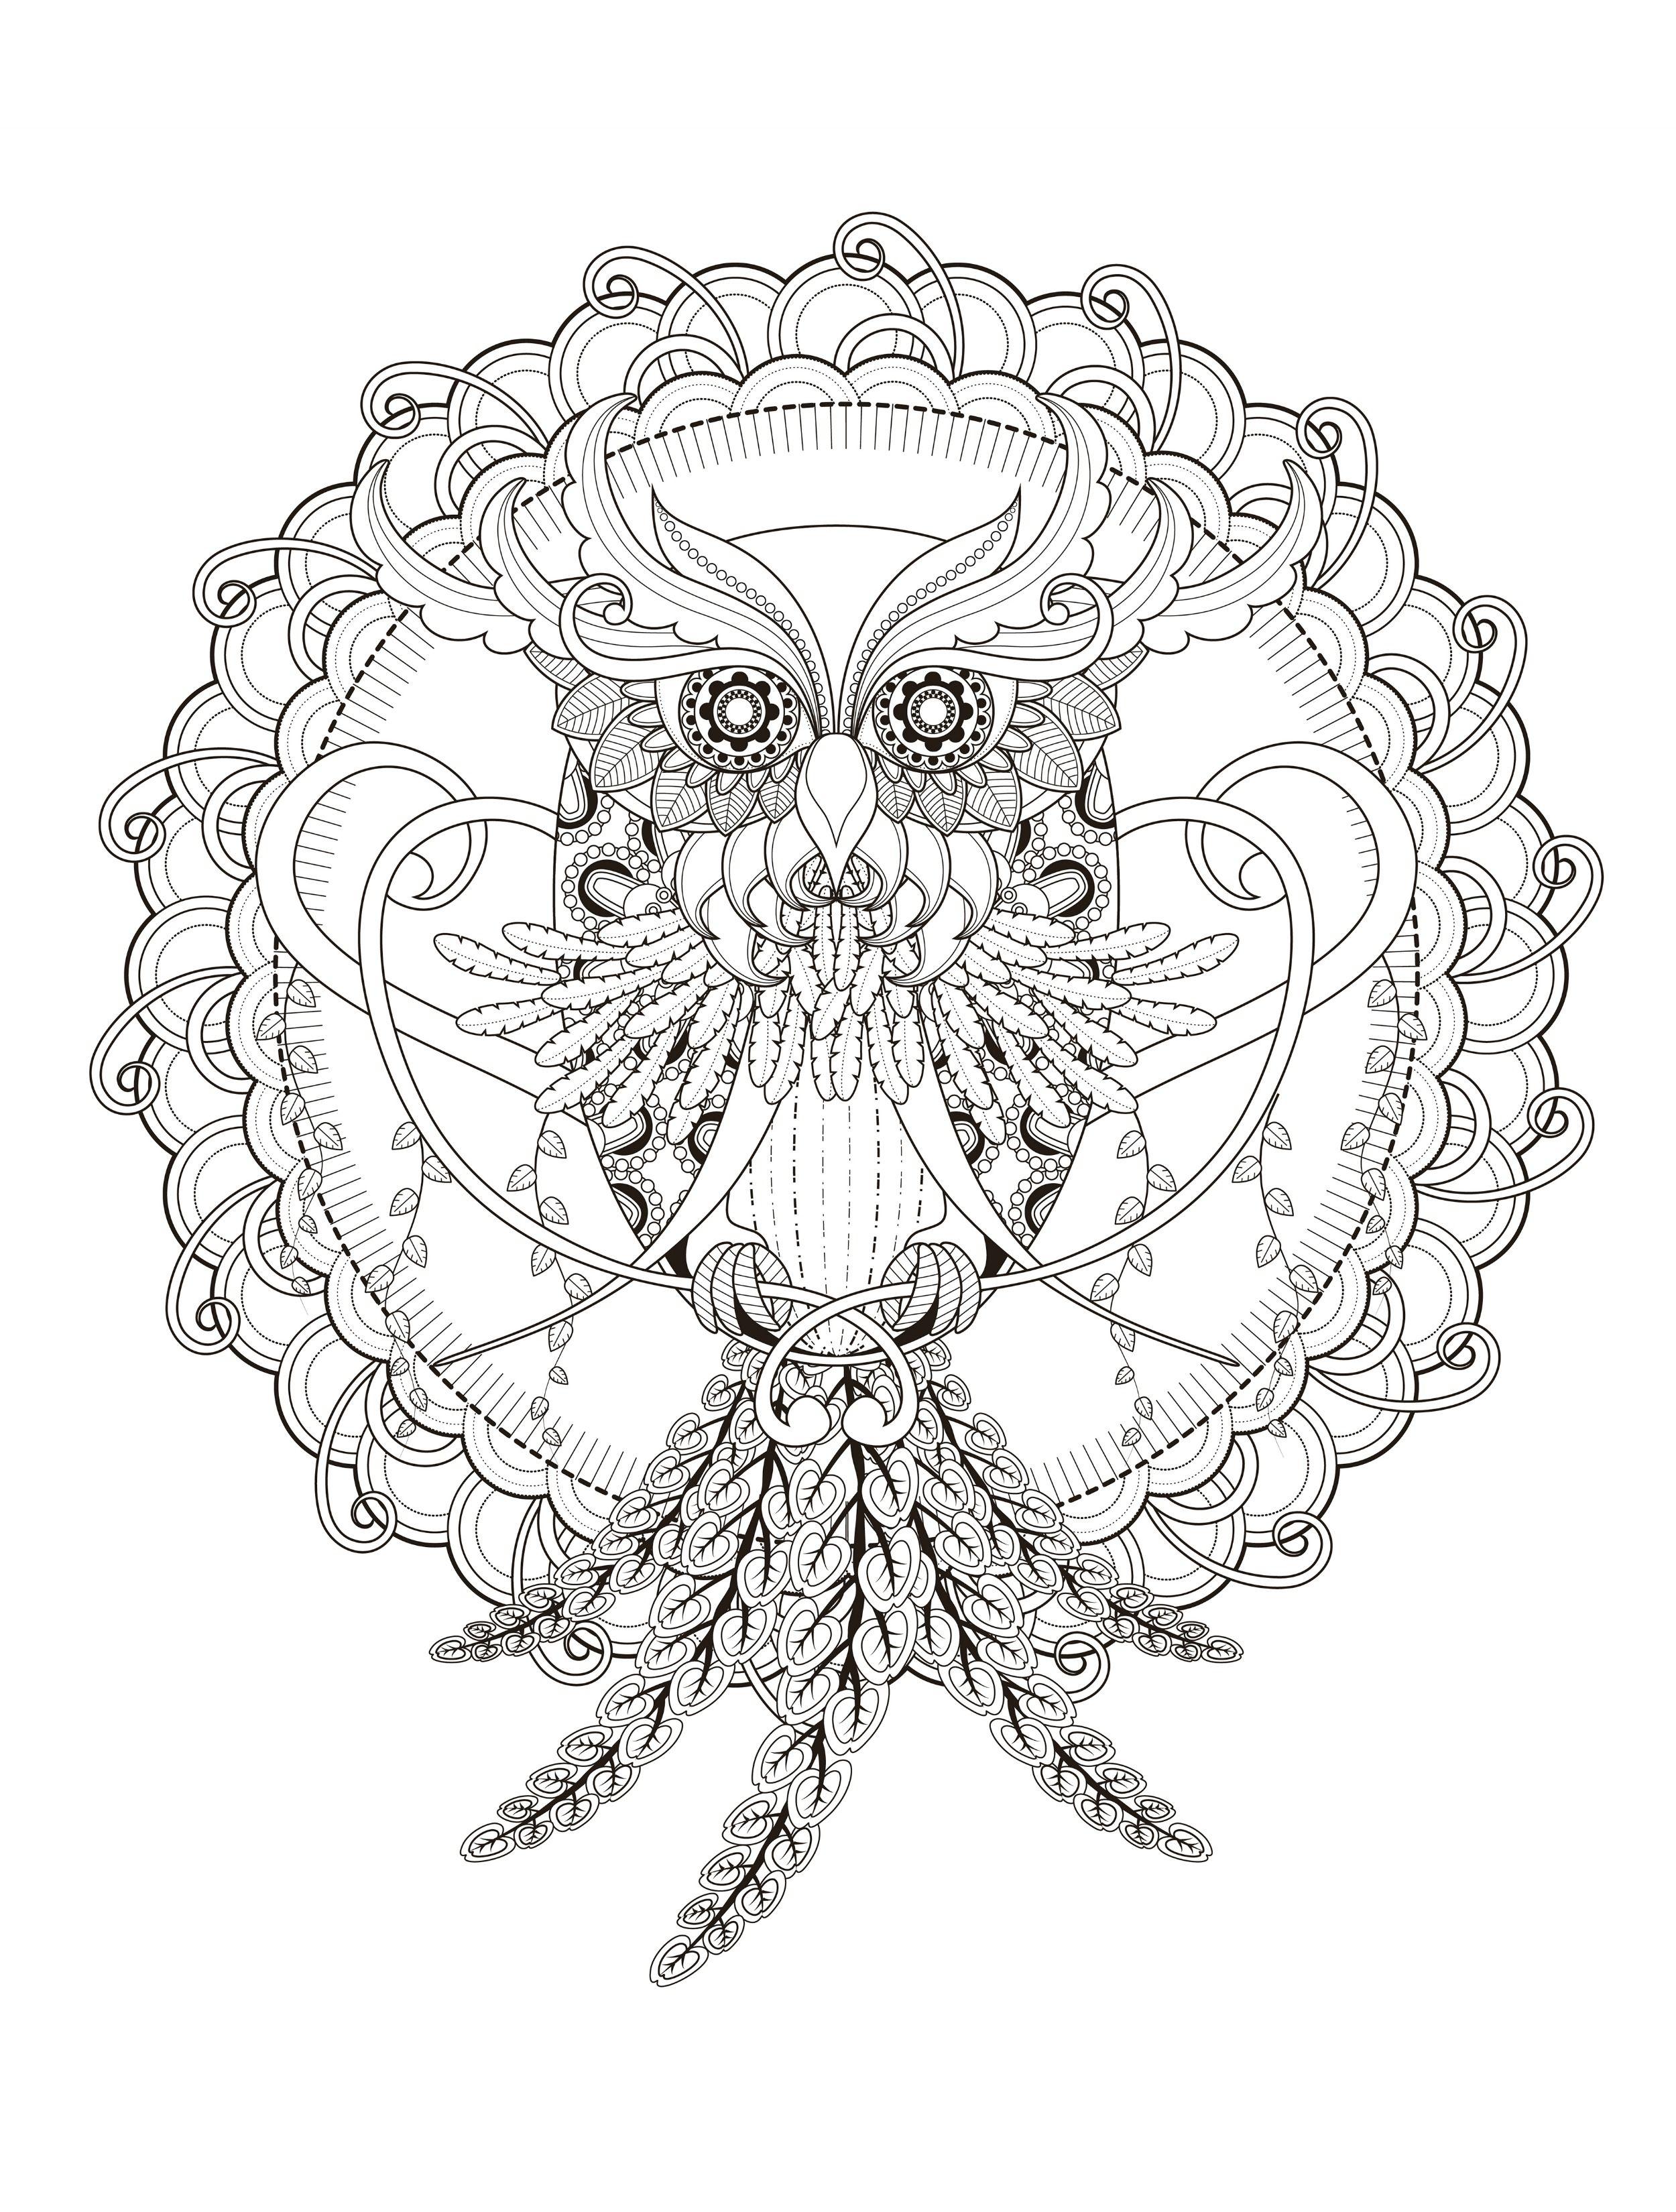 http://nerdymamma.com/wp-content/uploads/2016/02/owl-coloring-page ...